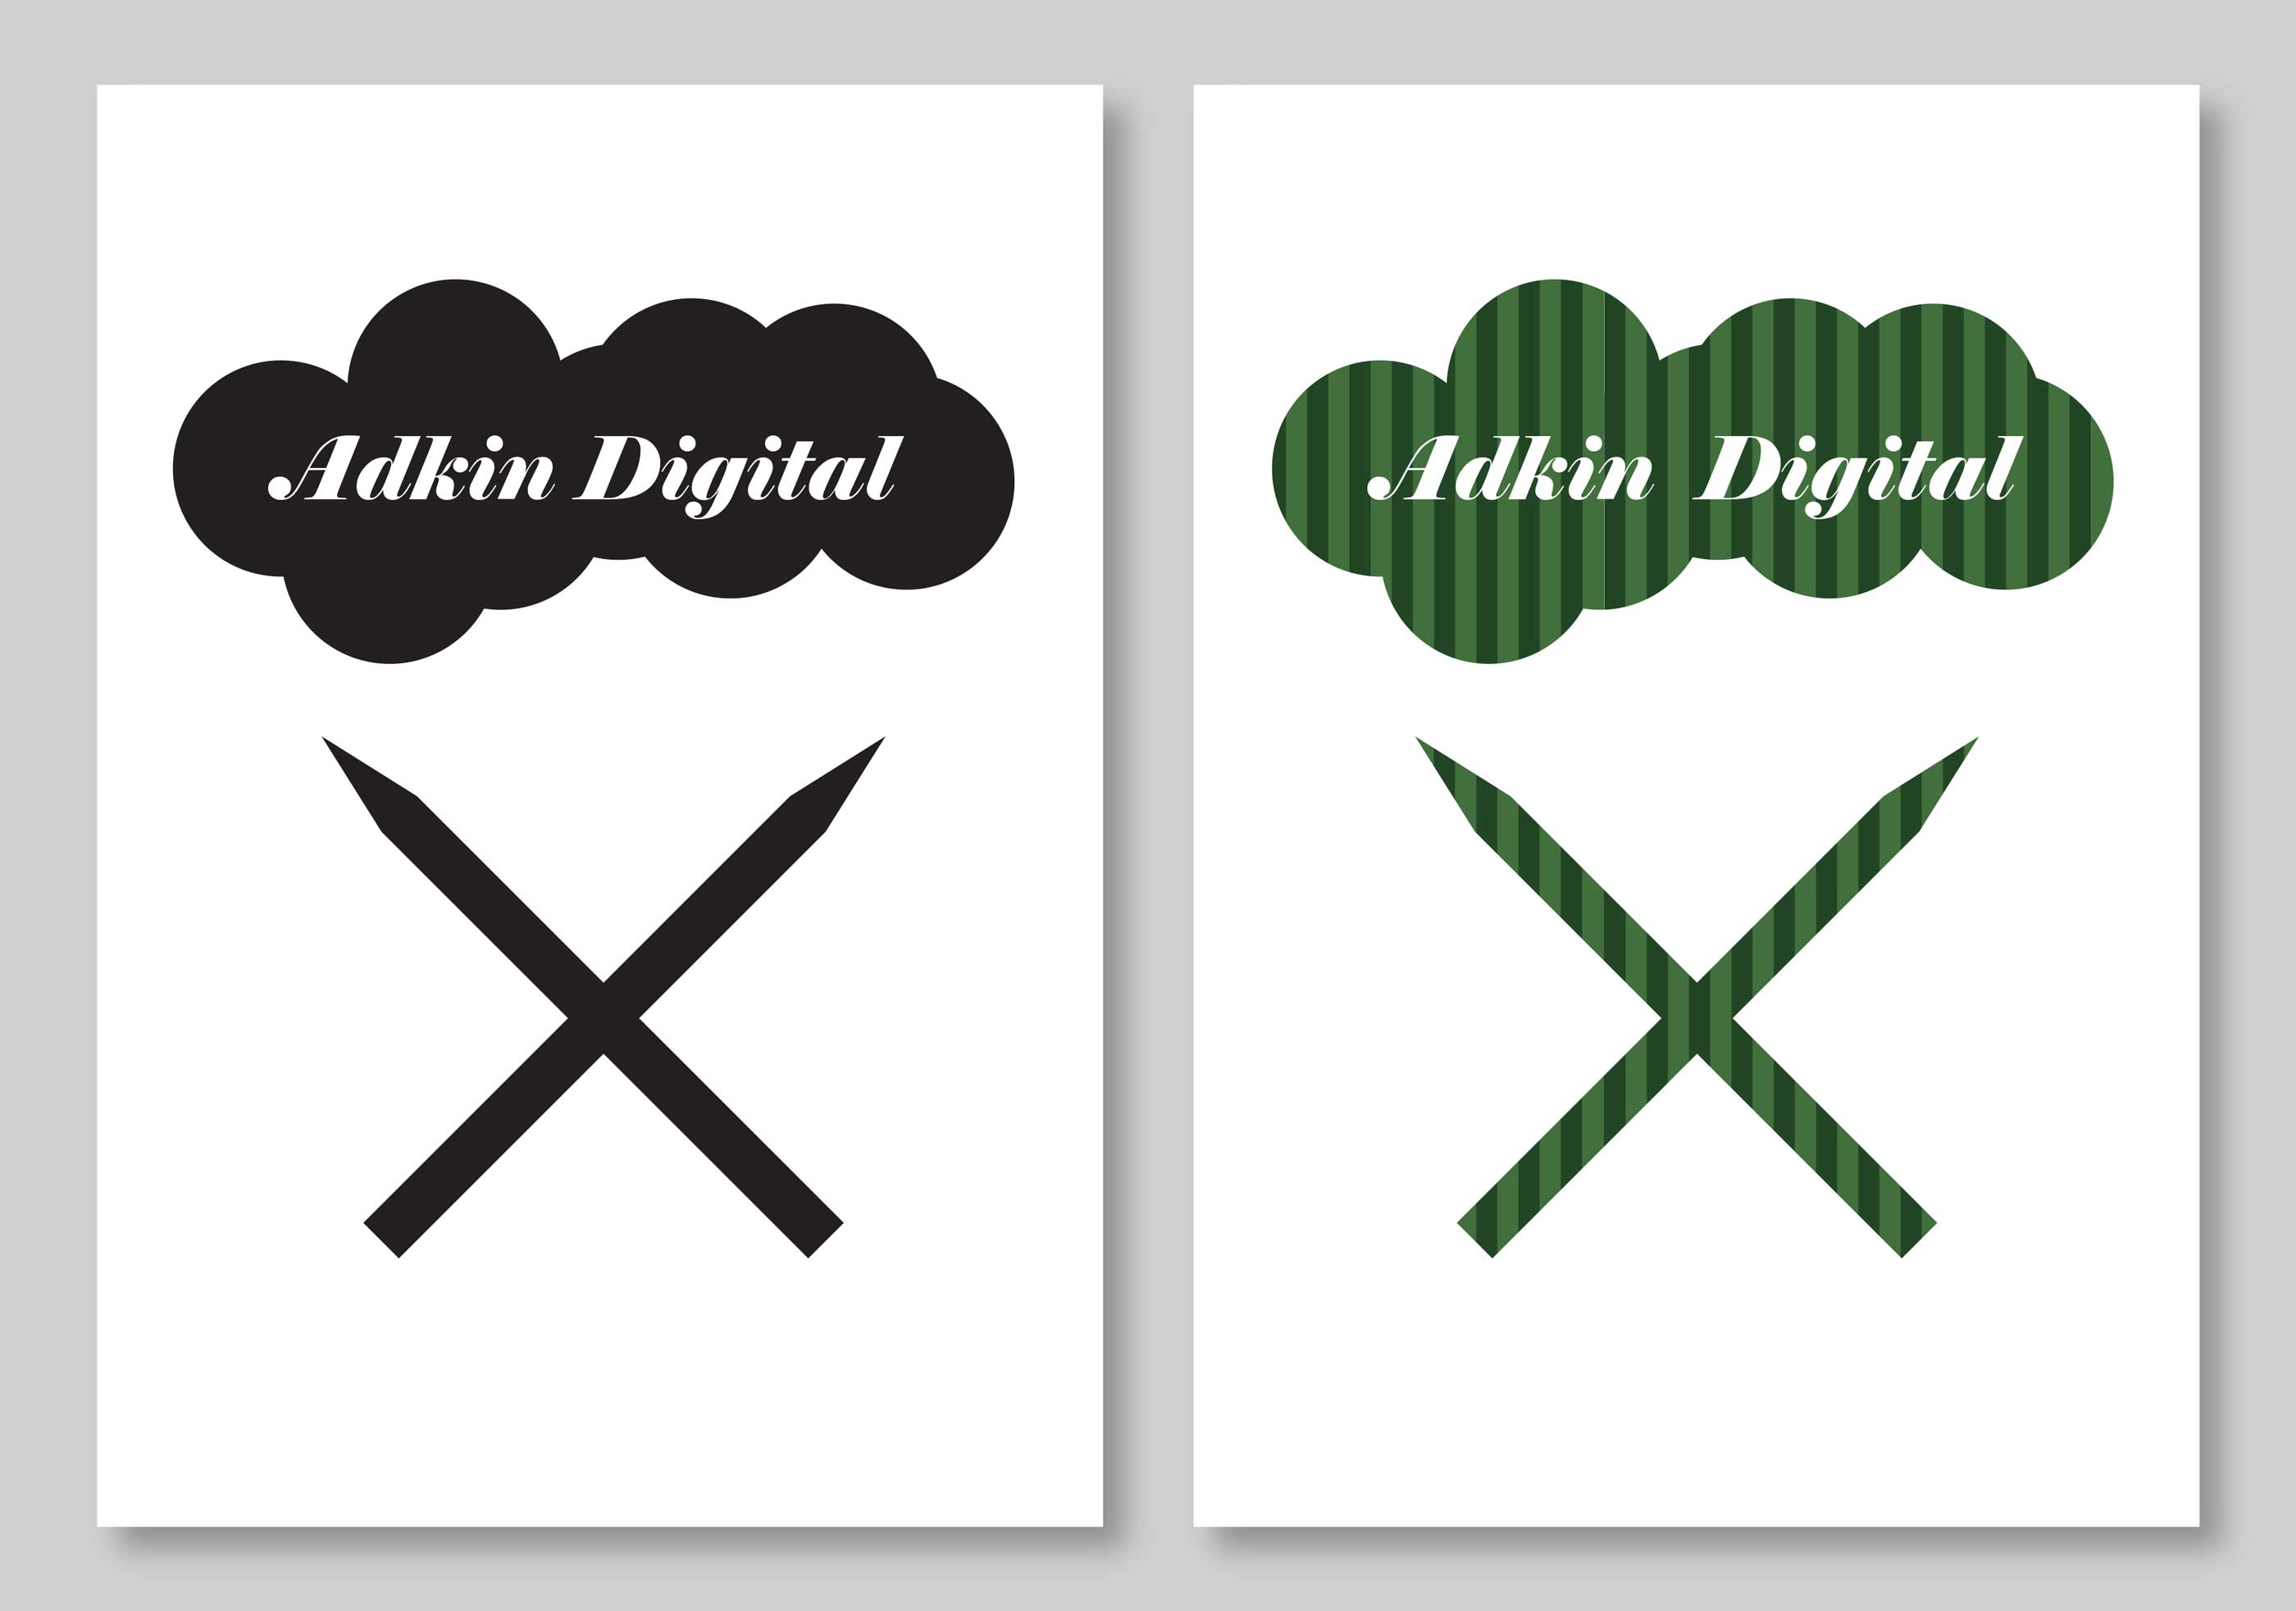 Adkin-Digital_01